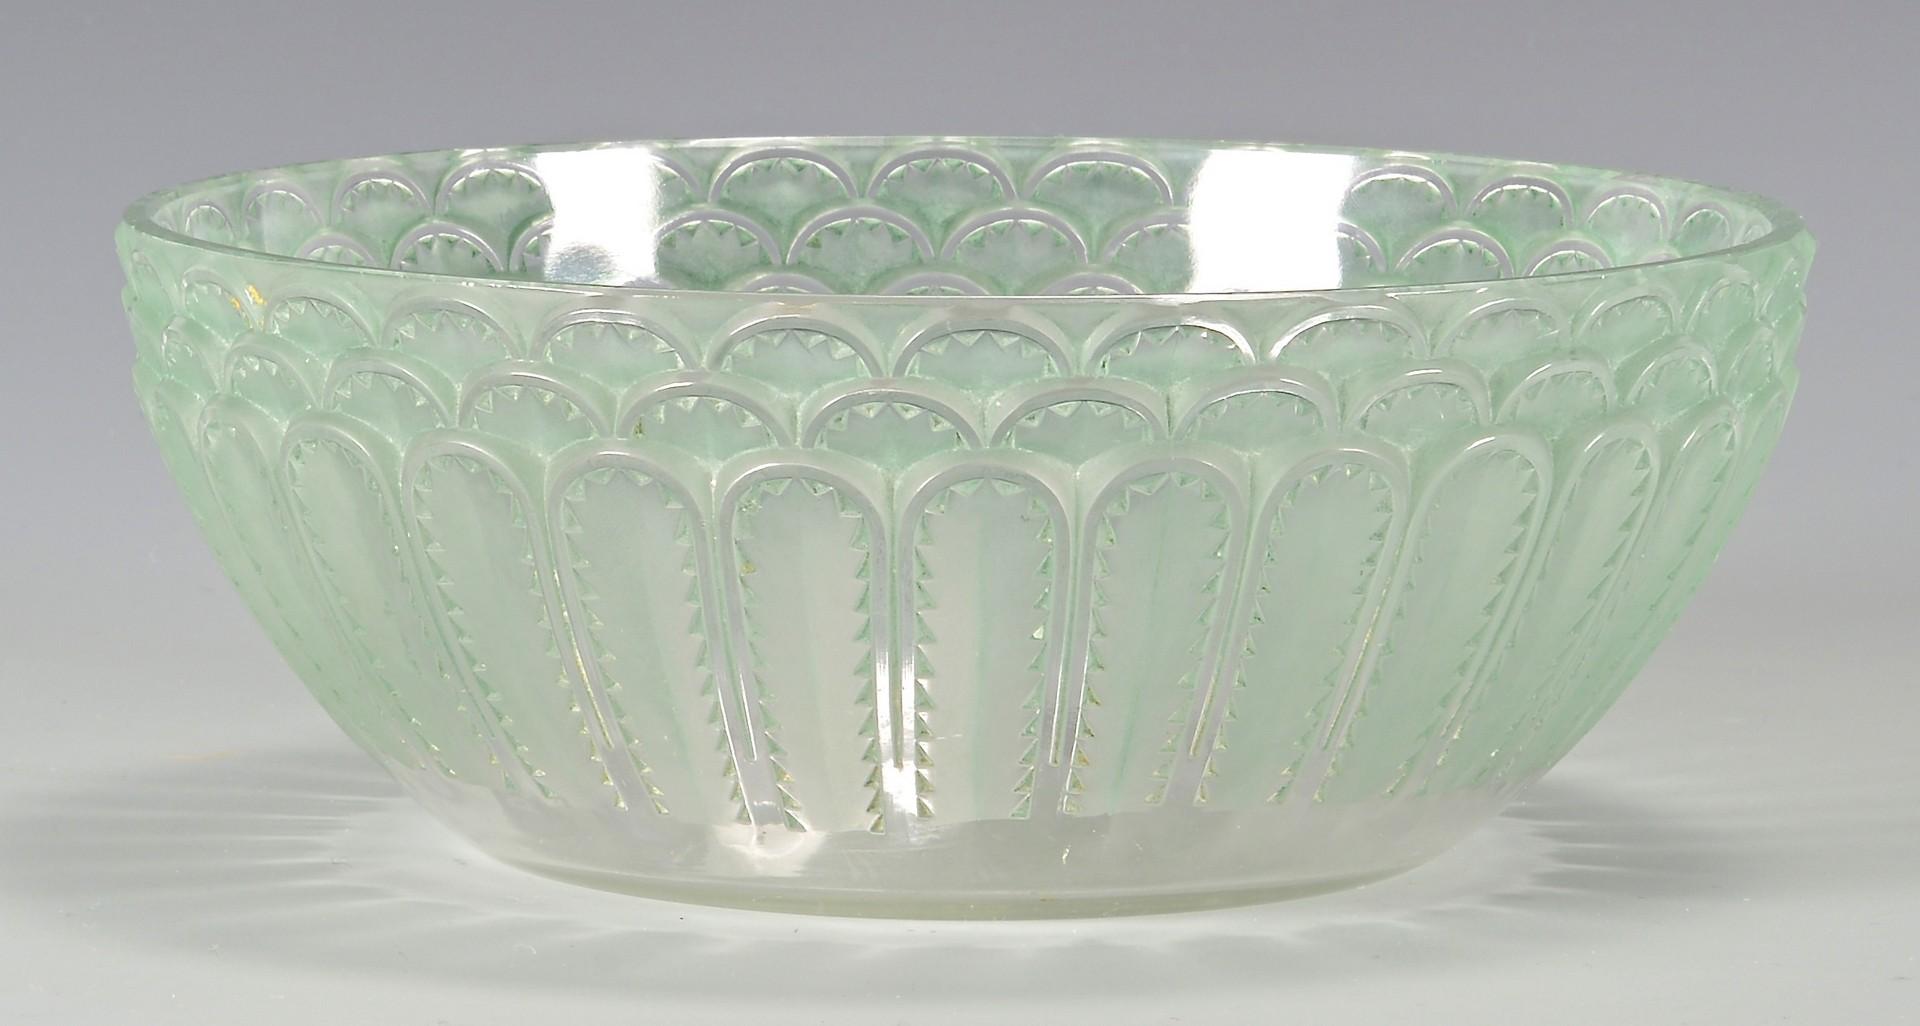 Lot 733: Rene Lalique Jaffa Bowl